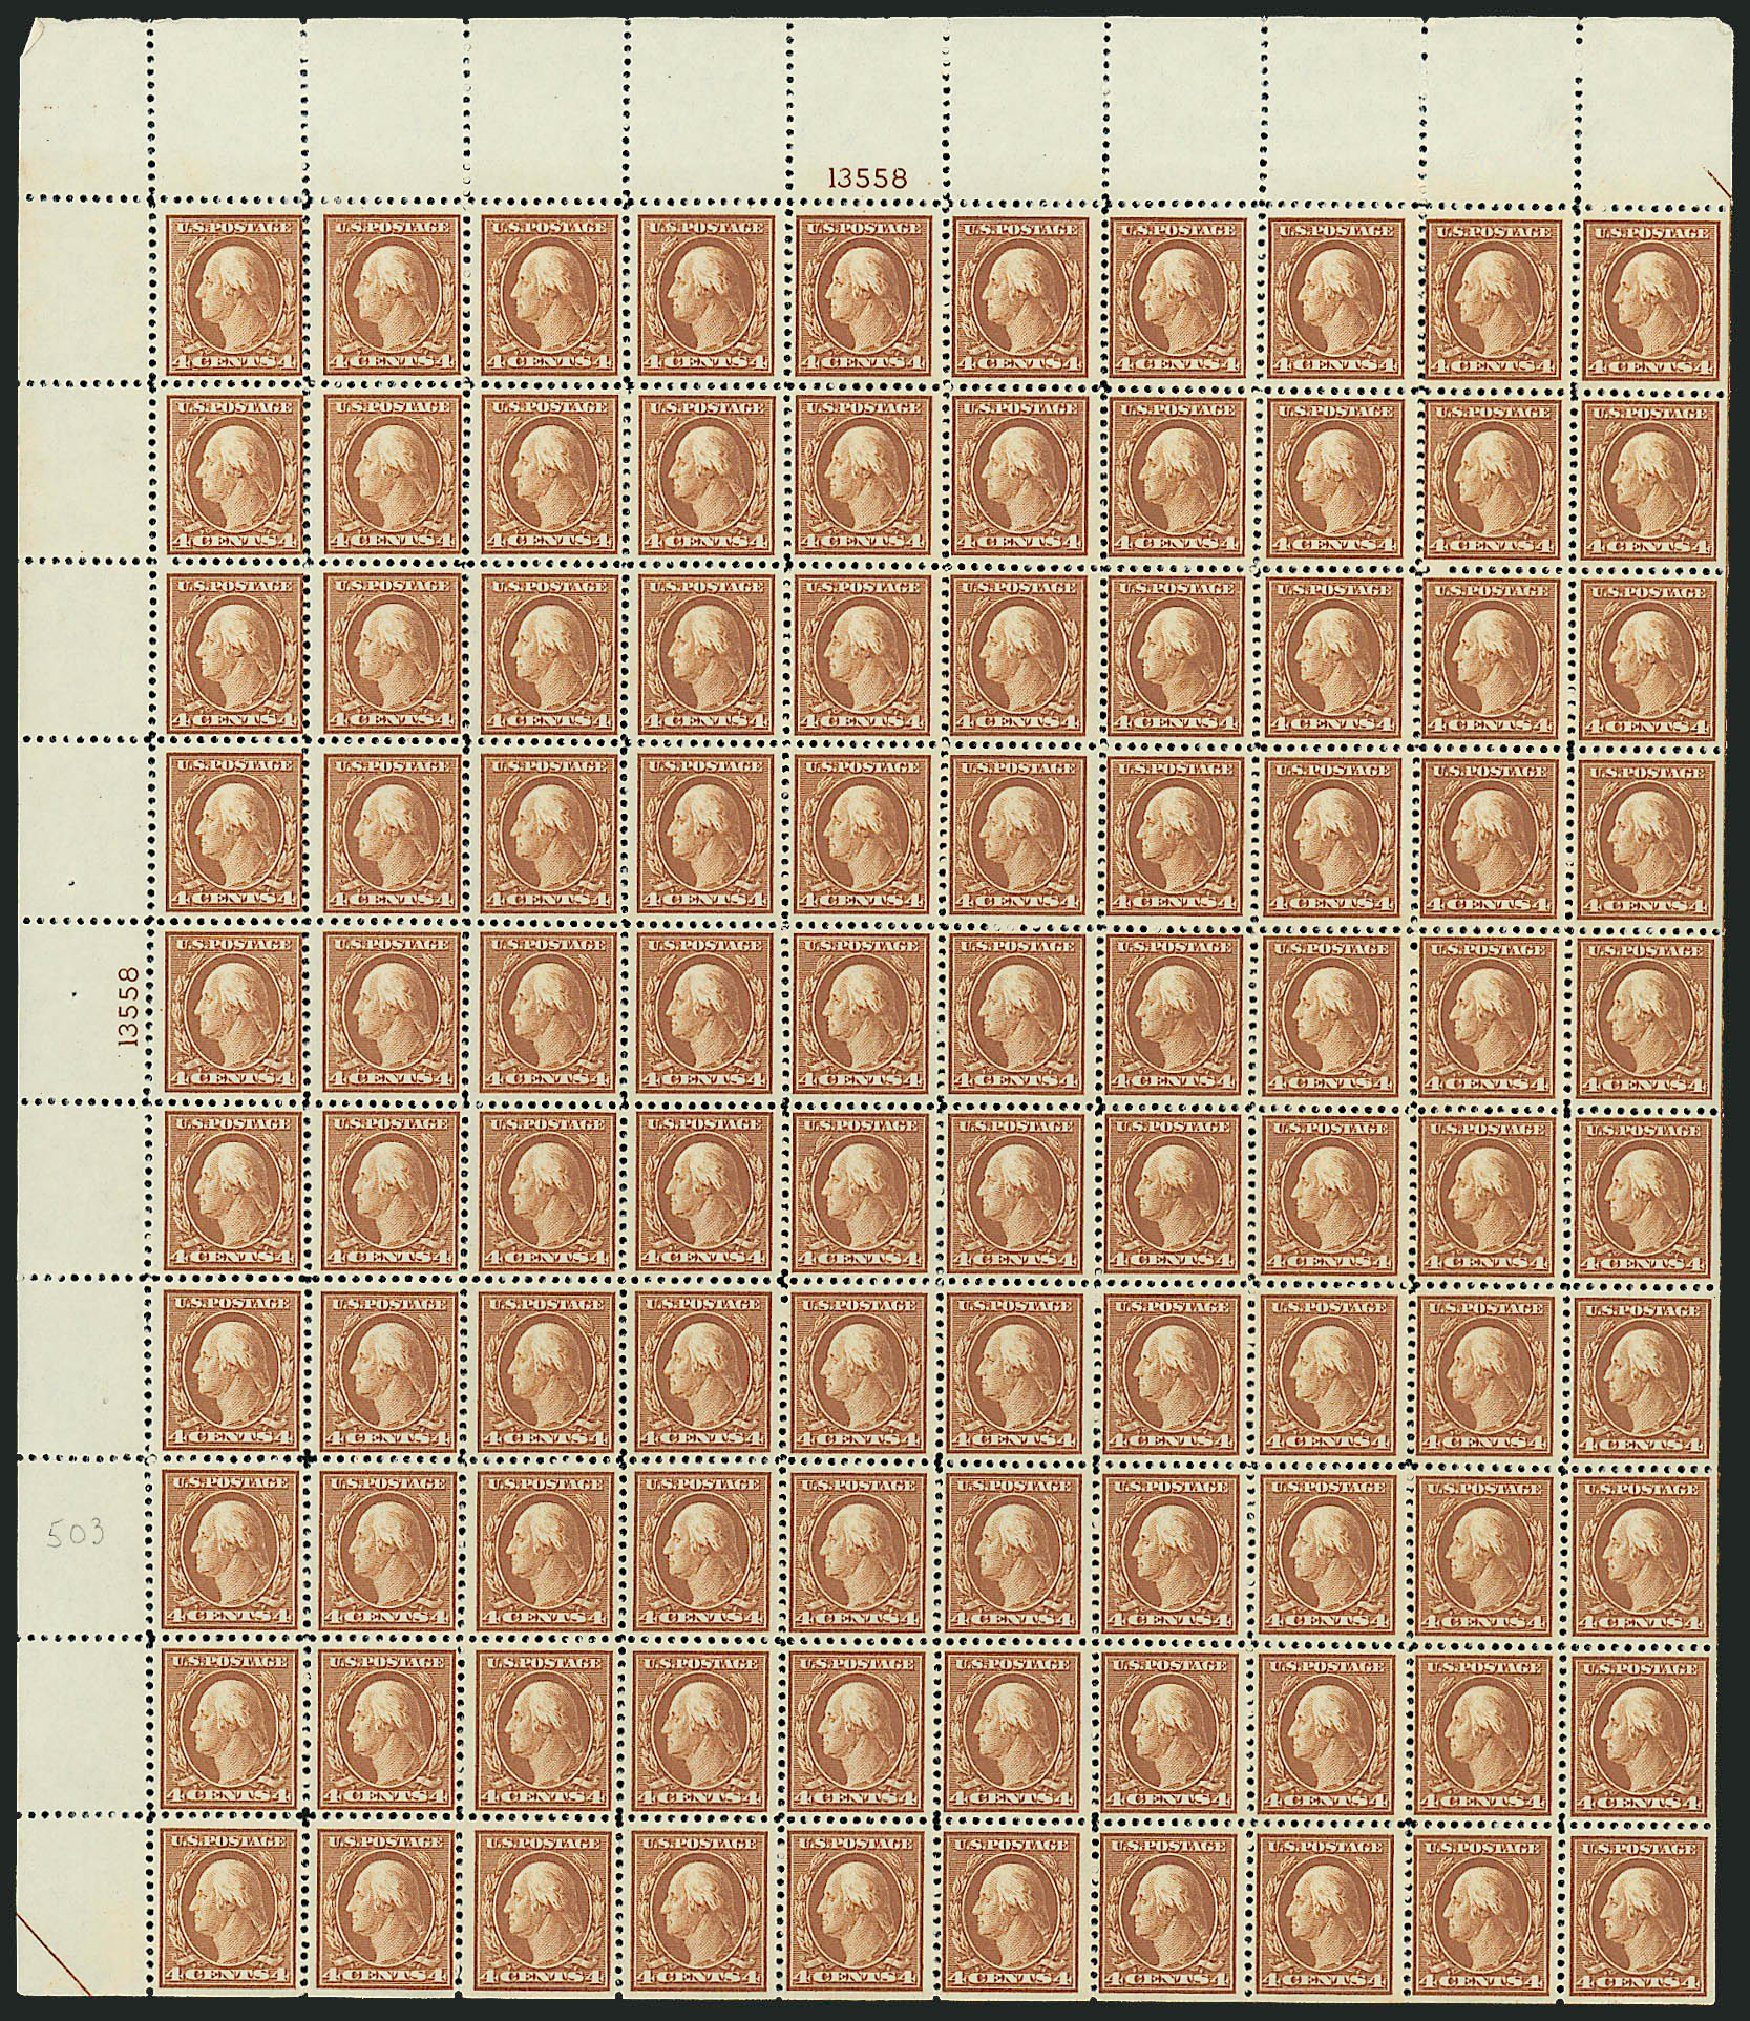 US Stamps Values Scott 503 - 4c 1917 Washington Perf 11. Robert Siegel Auction Galleries, Mar 2013, Sale 1040, Lot 1893